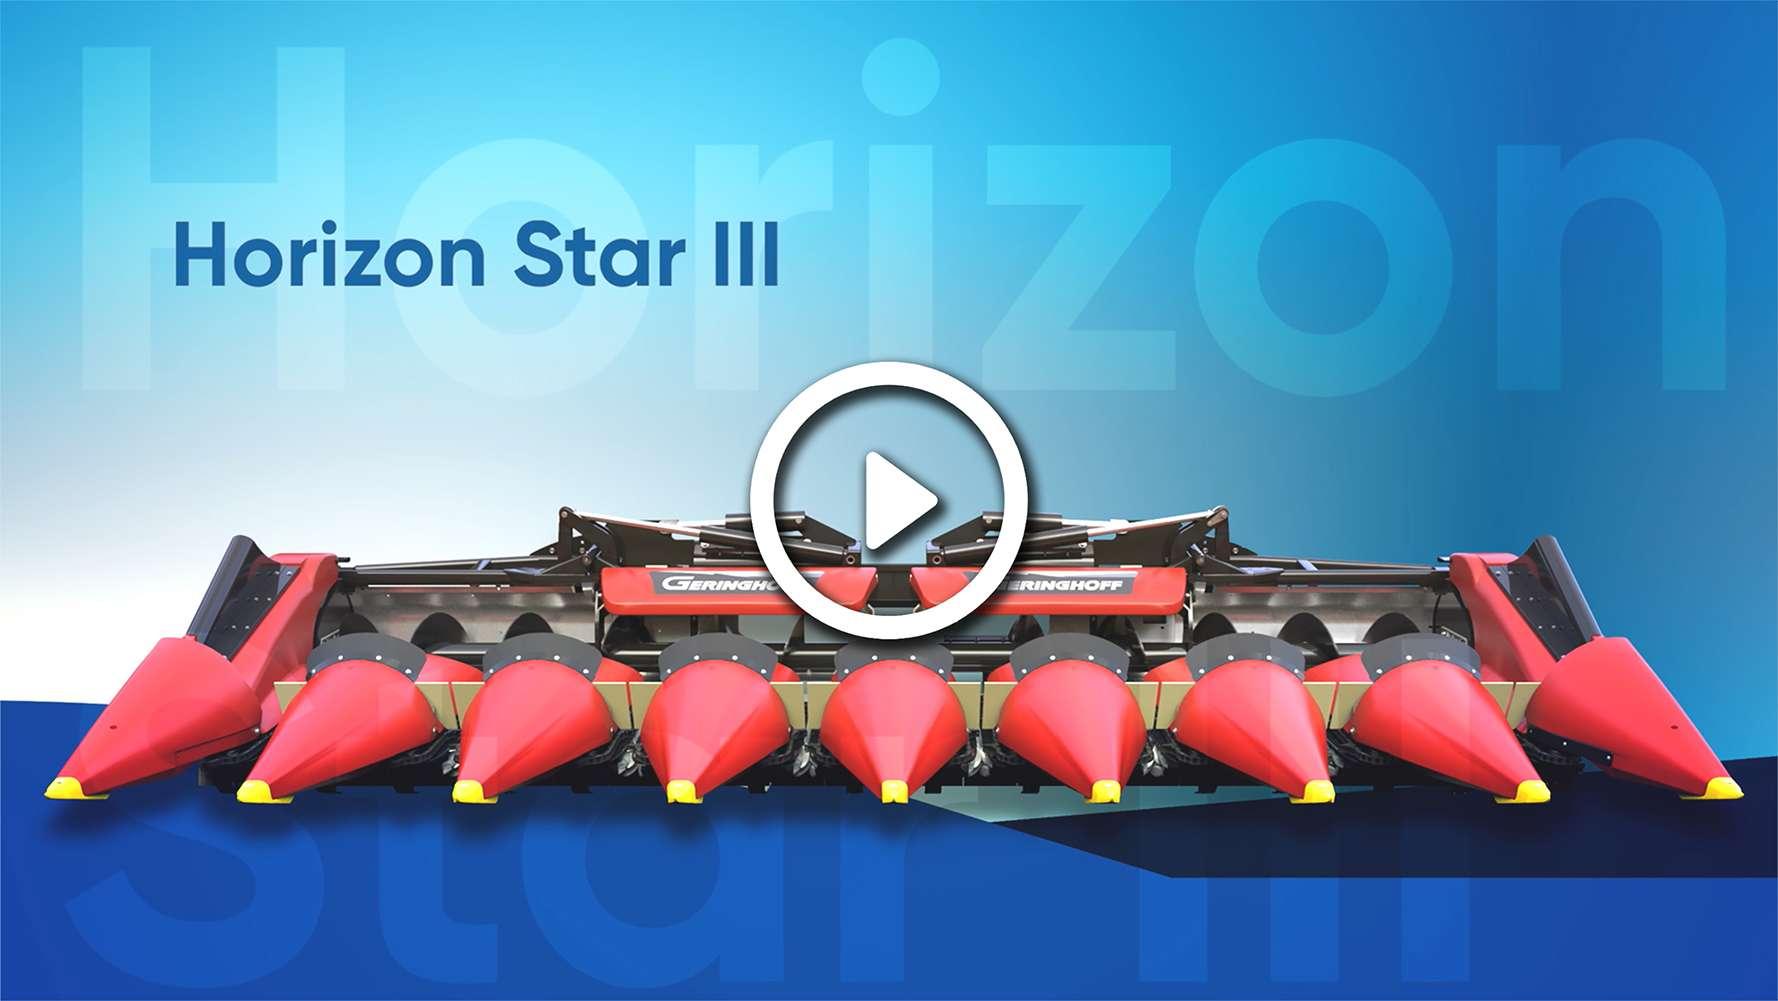 horizon star III product video